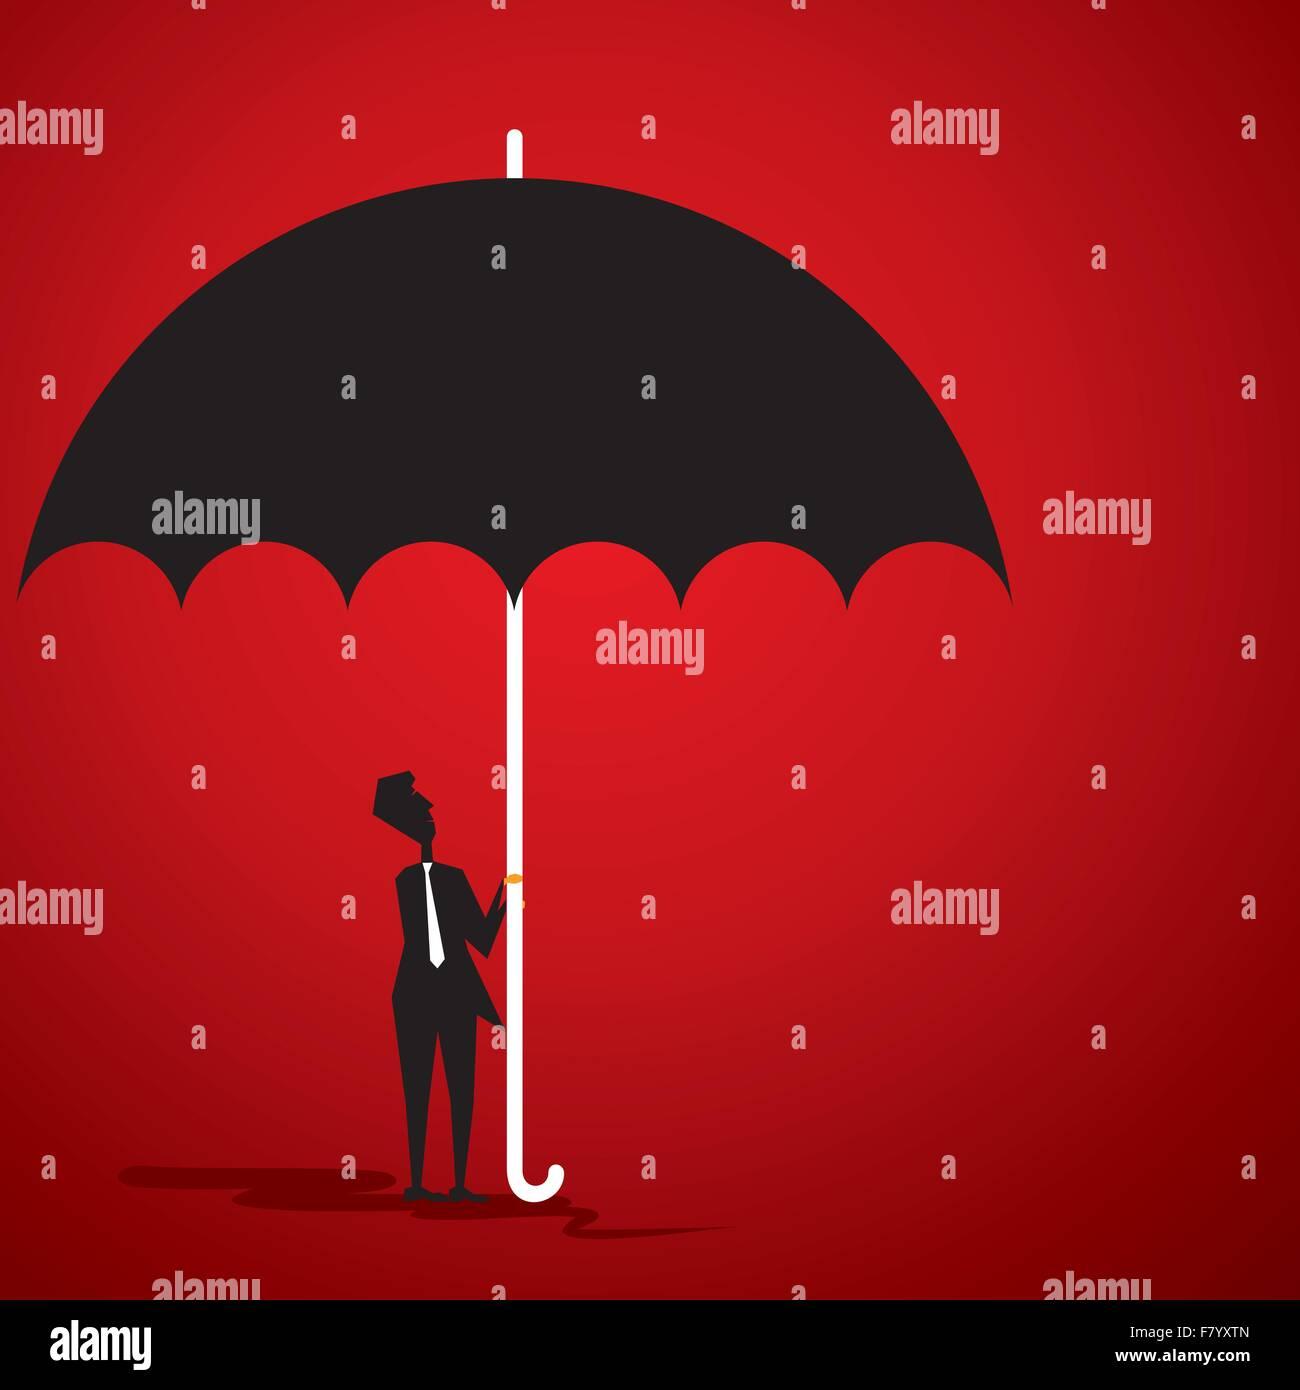 small men under big umbrella stock vector - Stock Image